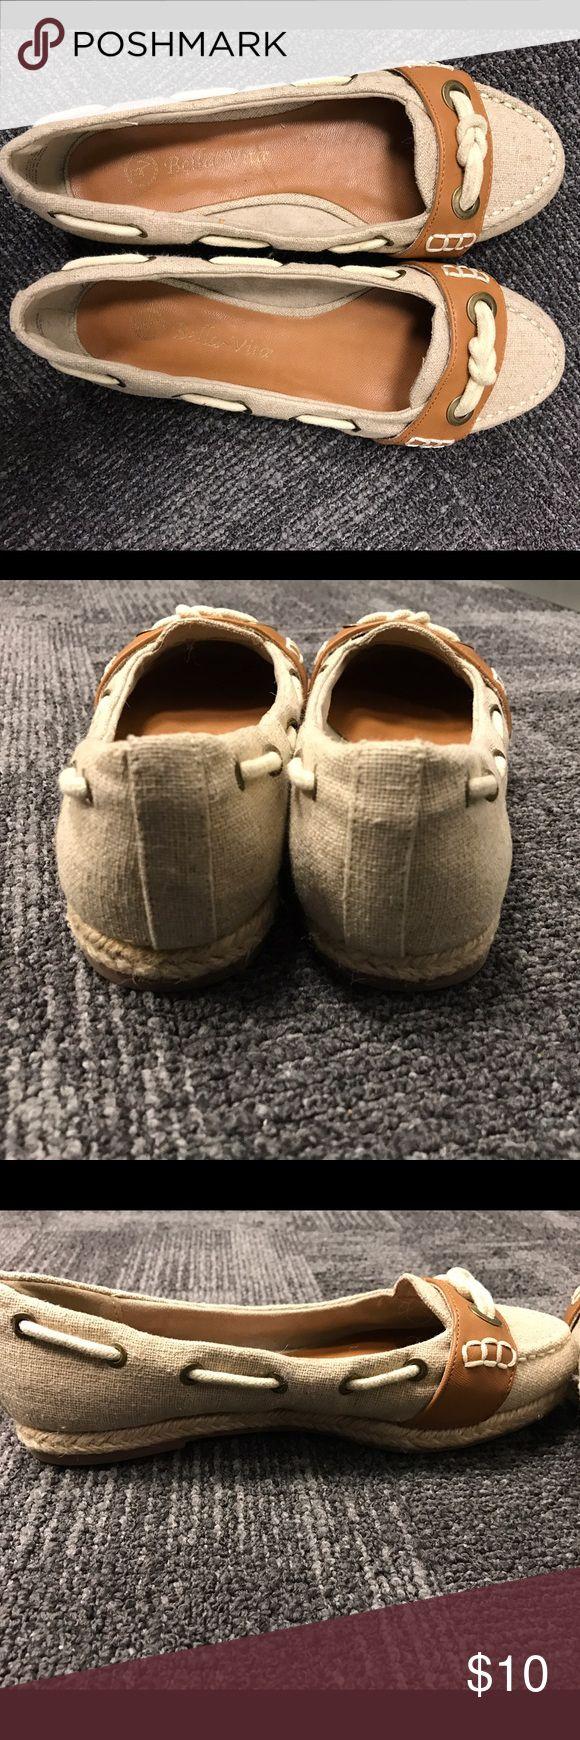 Selling this Bella Vita Women's Bella Vita Buoy II Flat on Poshmark! My username is: moitory. #shopmycloset #poshmark #fashion #shopping #style #forsale #Bella Vita #Shoes